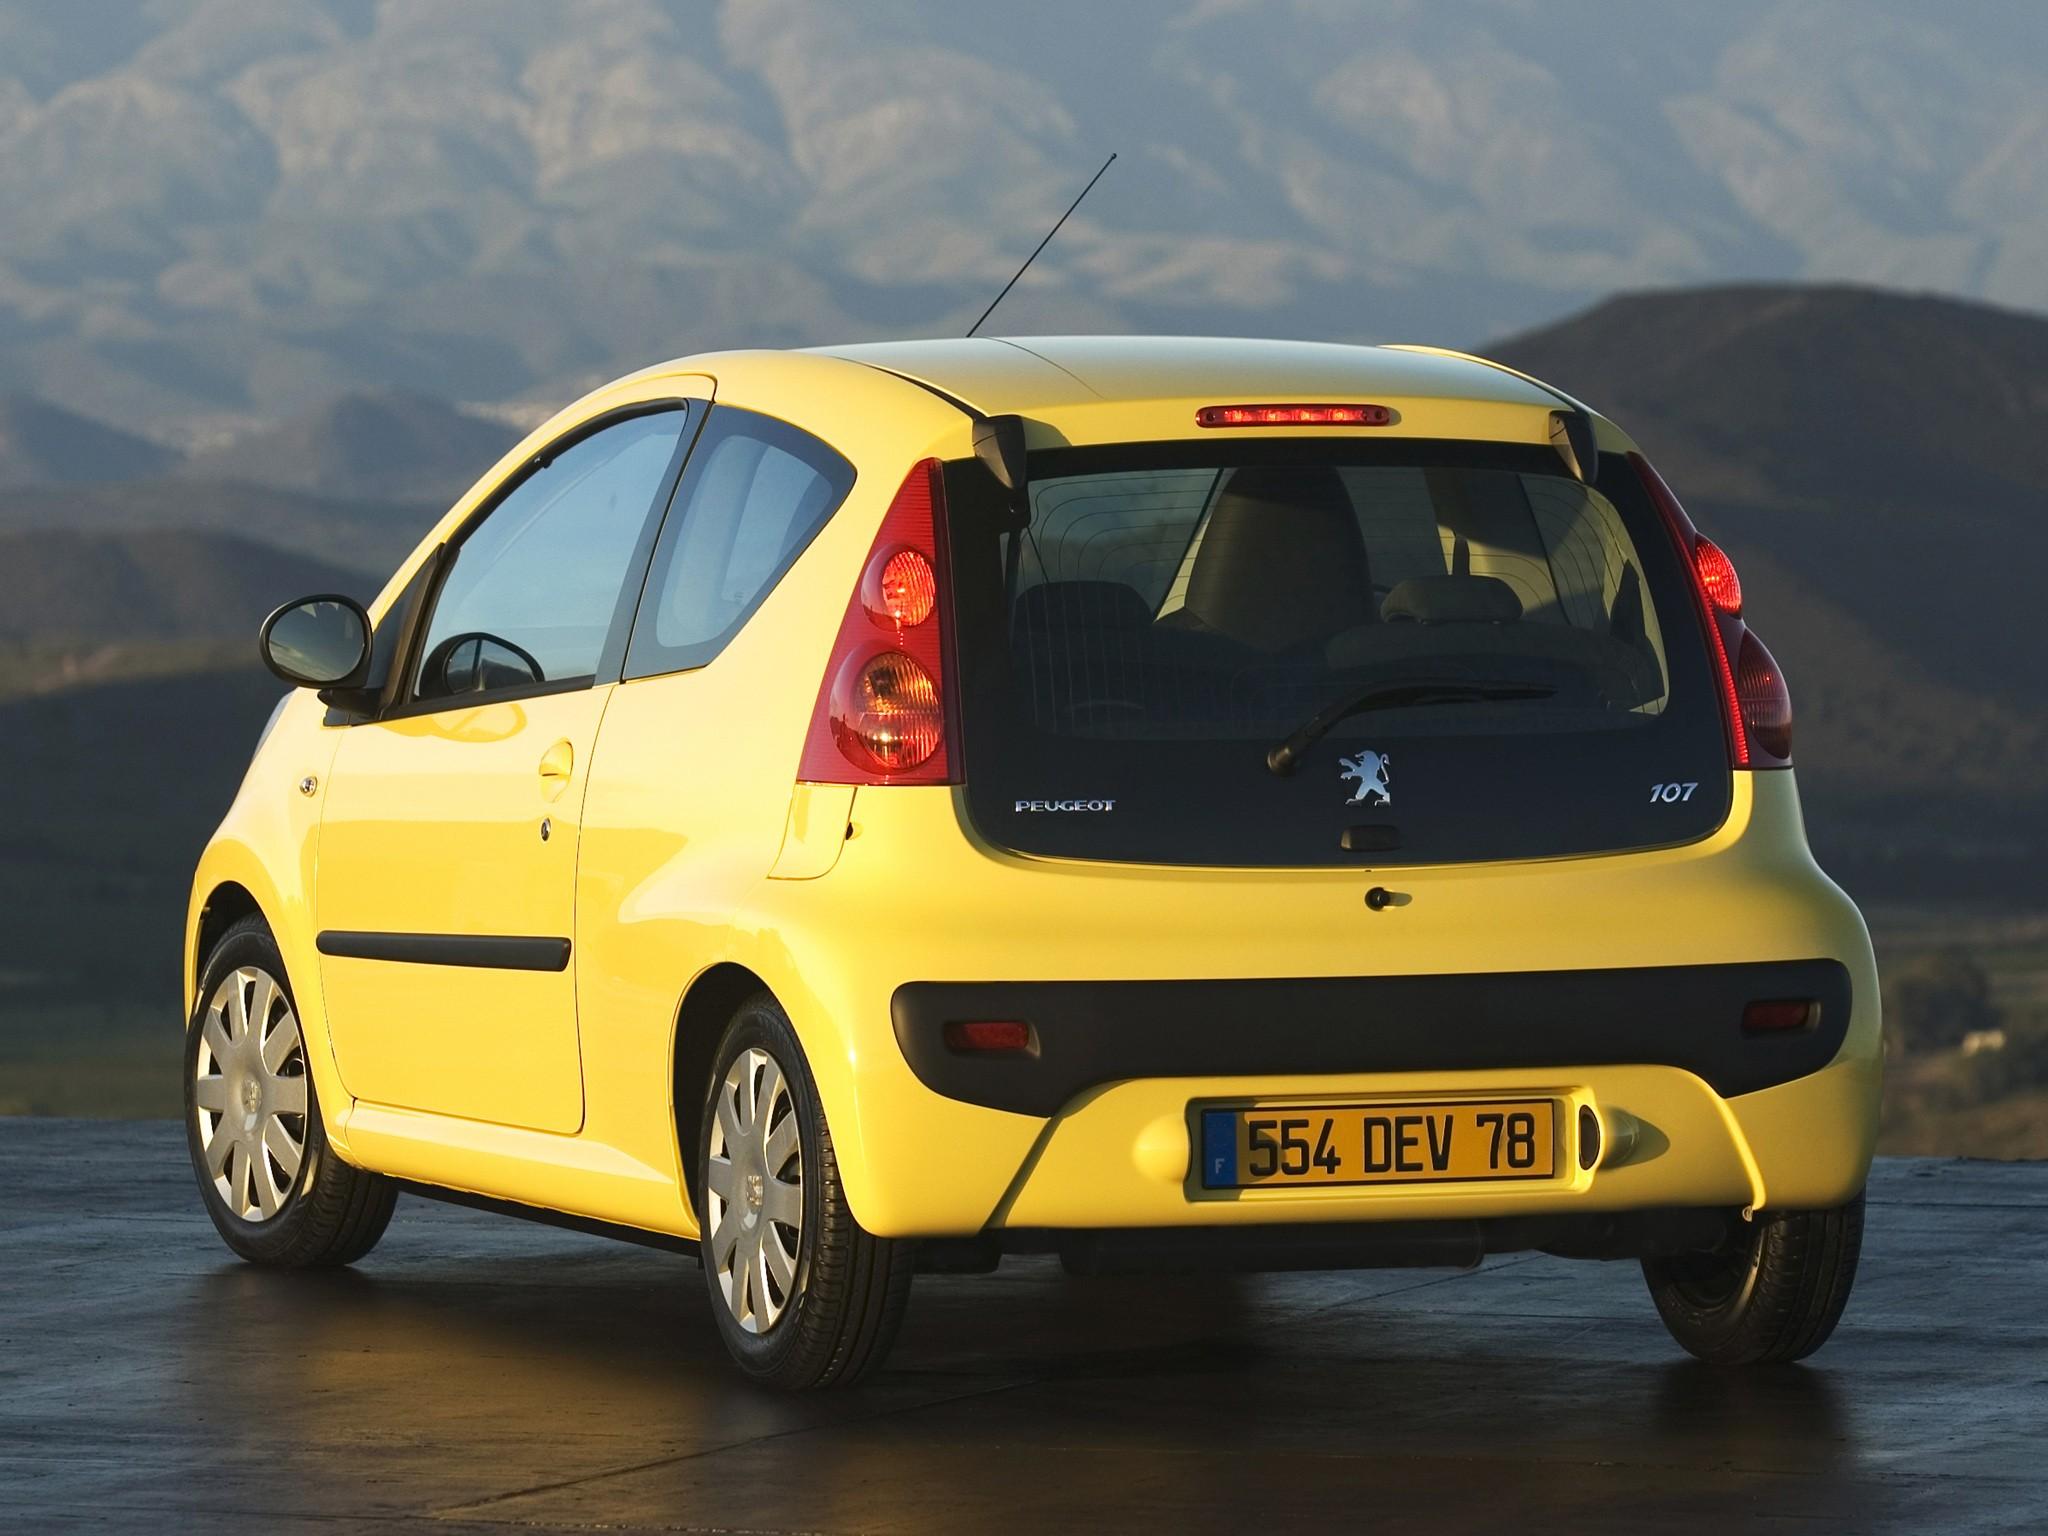 peugeot 107 3 doors specs - 2005, 2006, 2007, 2008 - autoevolution